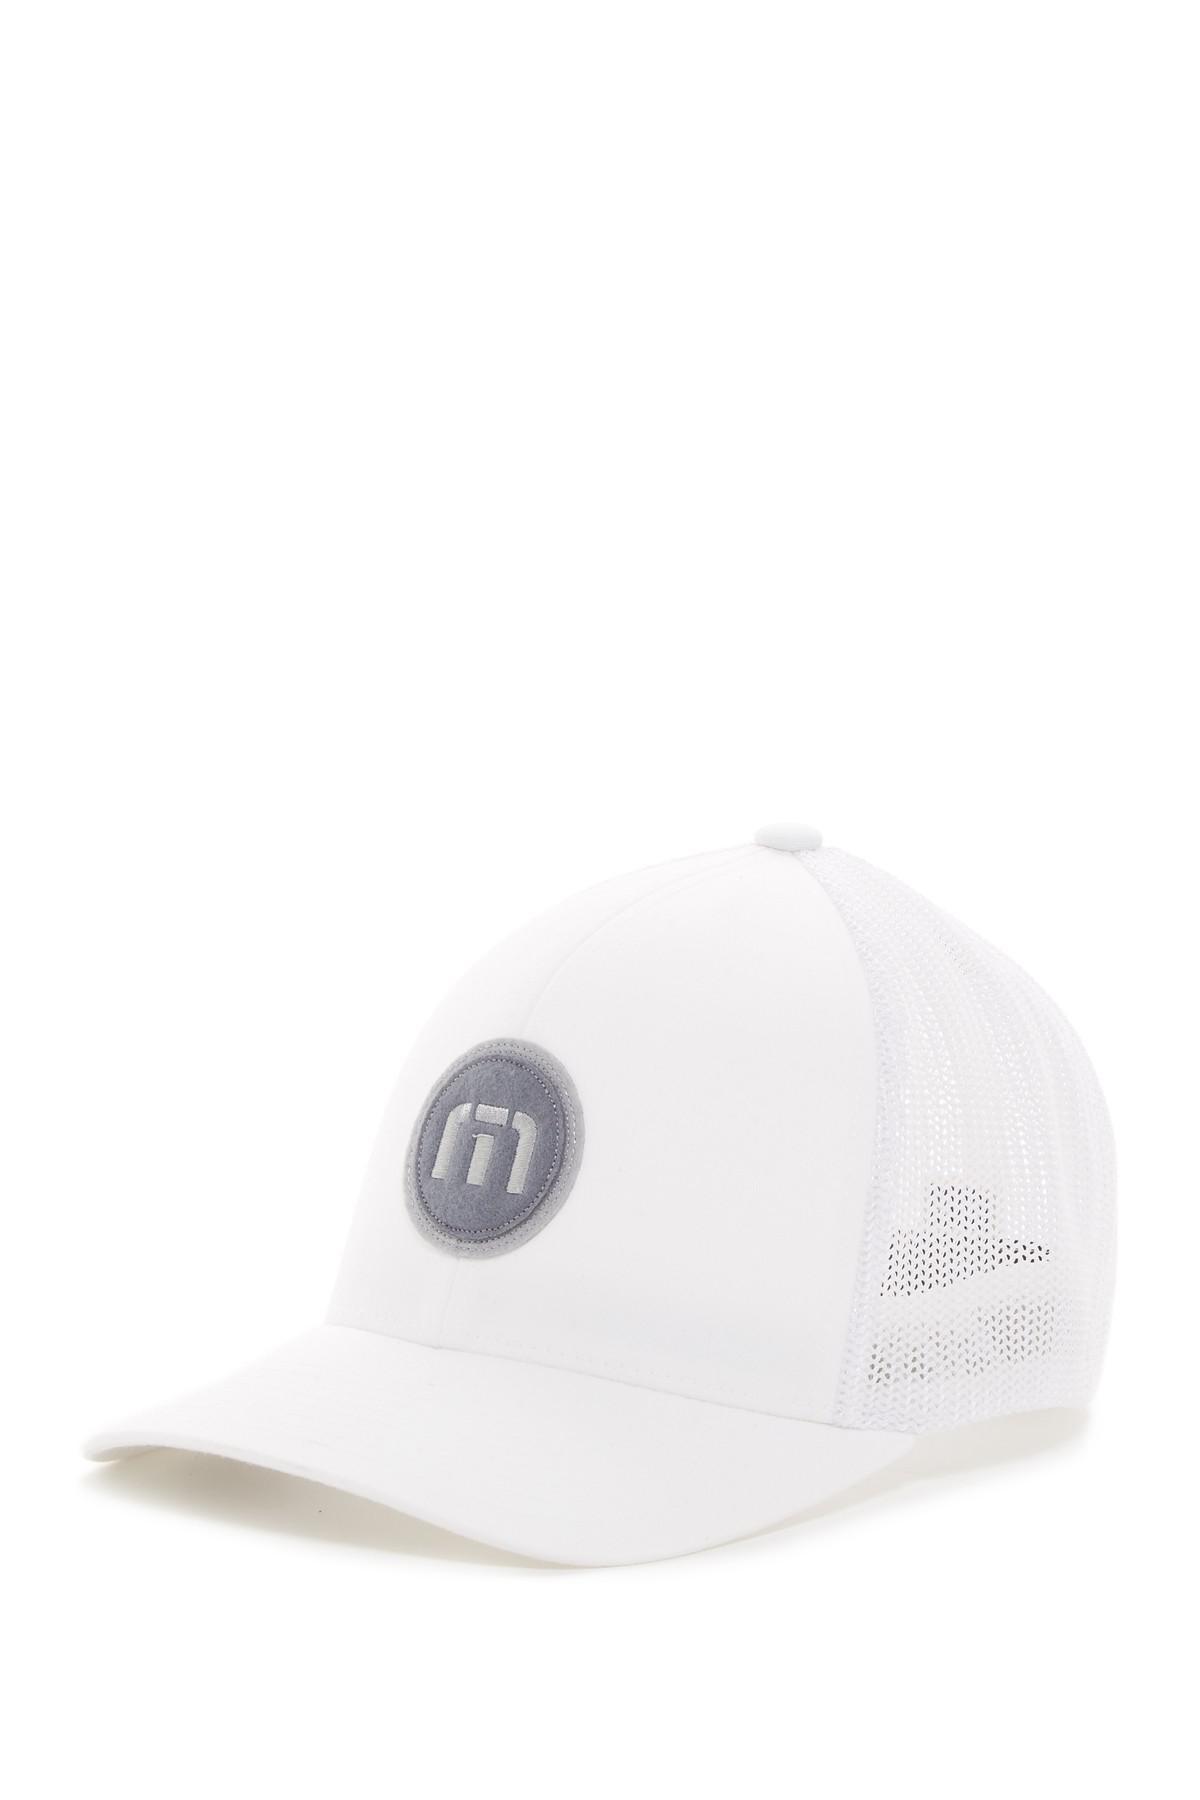 promo code 68ab5 f9645 ... italy lyst travis mathew allen trucker hat in white for men 66376 e5542